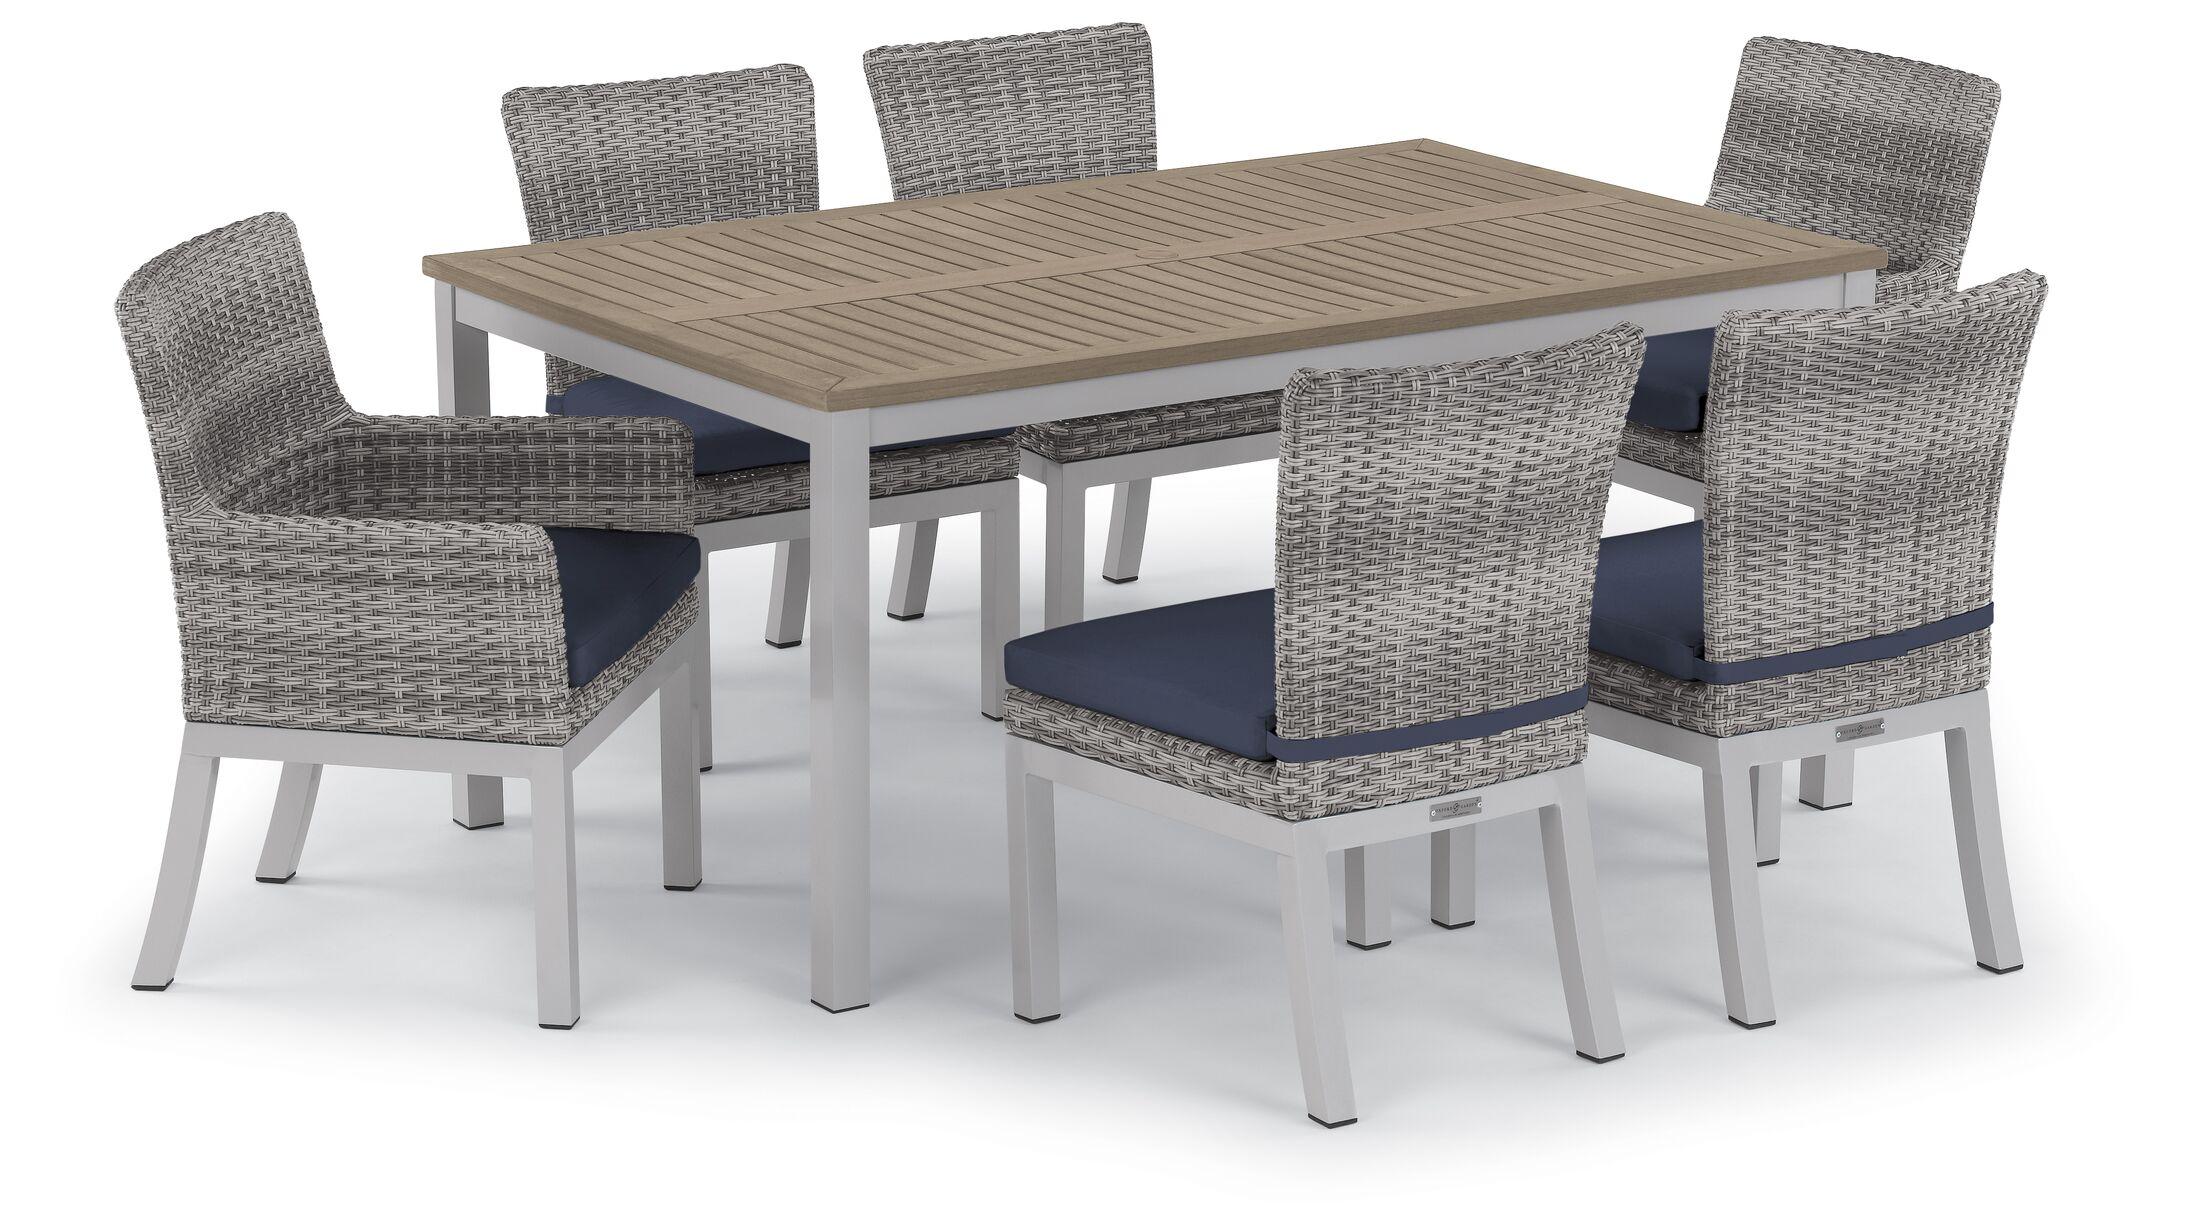 Saleh 7 Piece Sunbrella Dining Set with Cushions Cushion Color: Midnight Blue